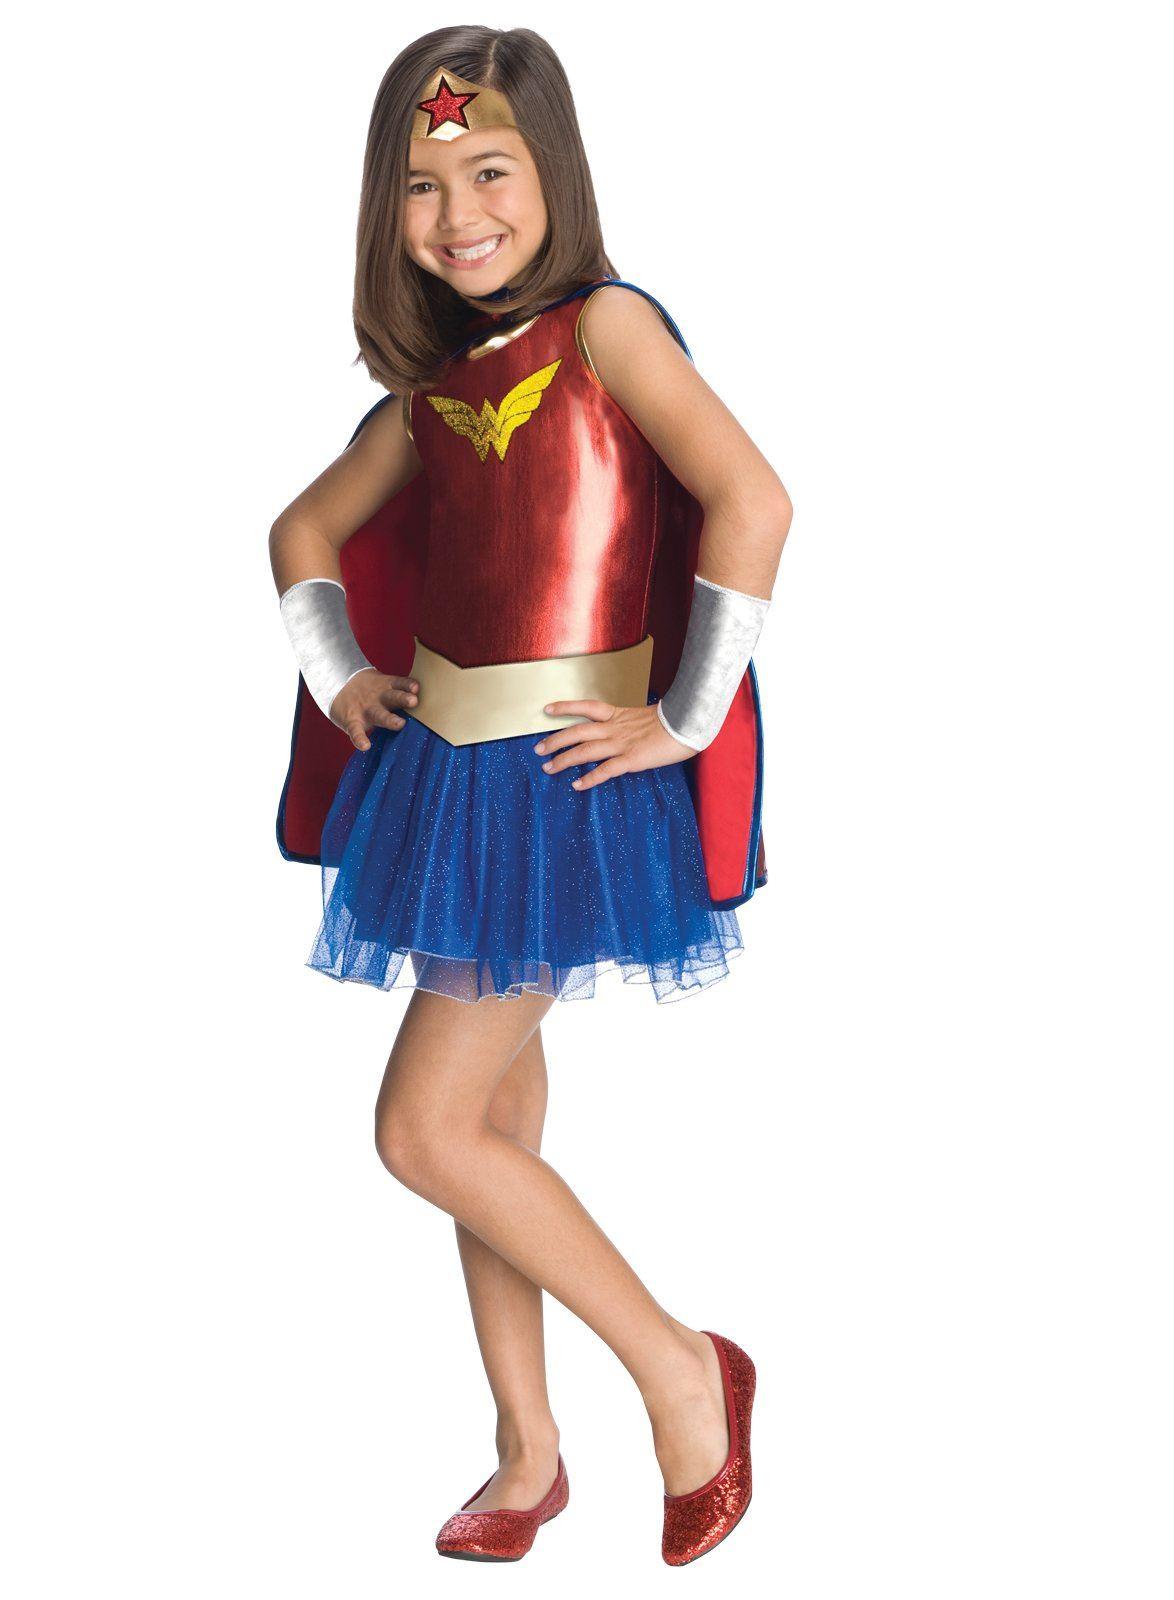 Kids Wonder Woman Girls Costume - $33.99 - The Costume Land